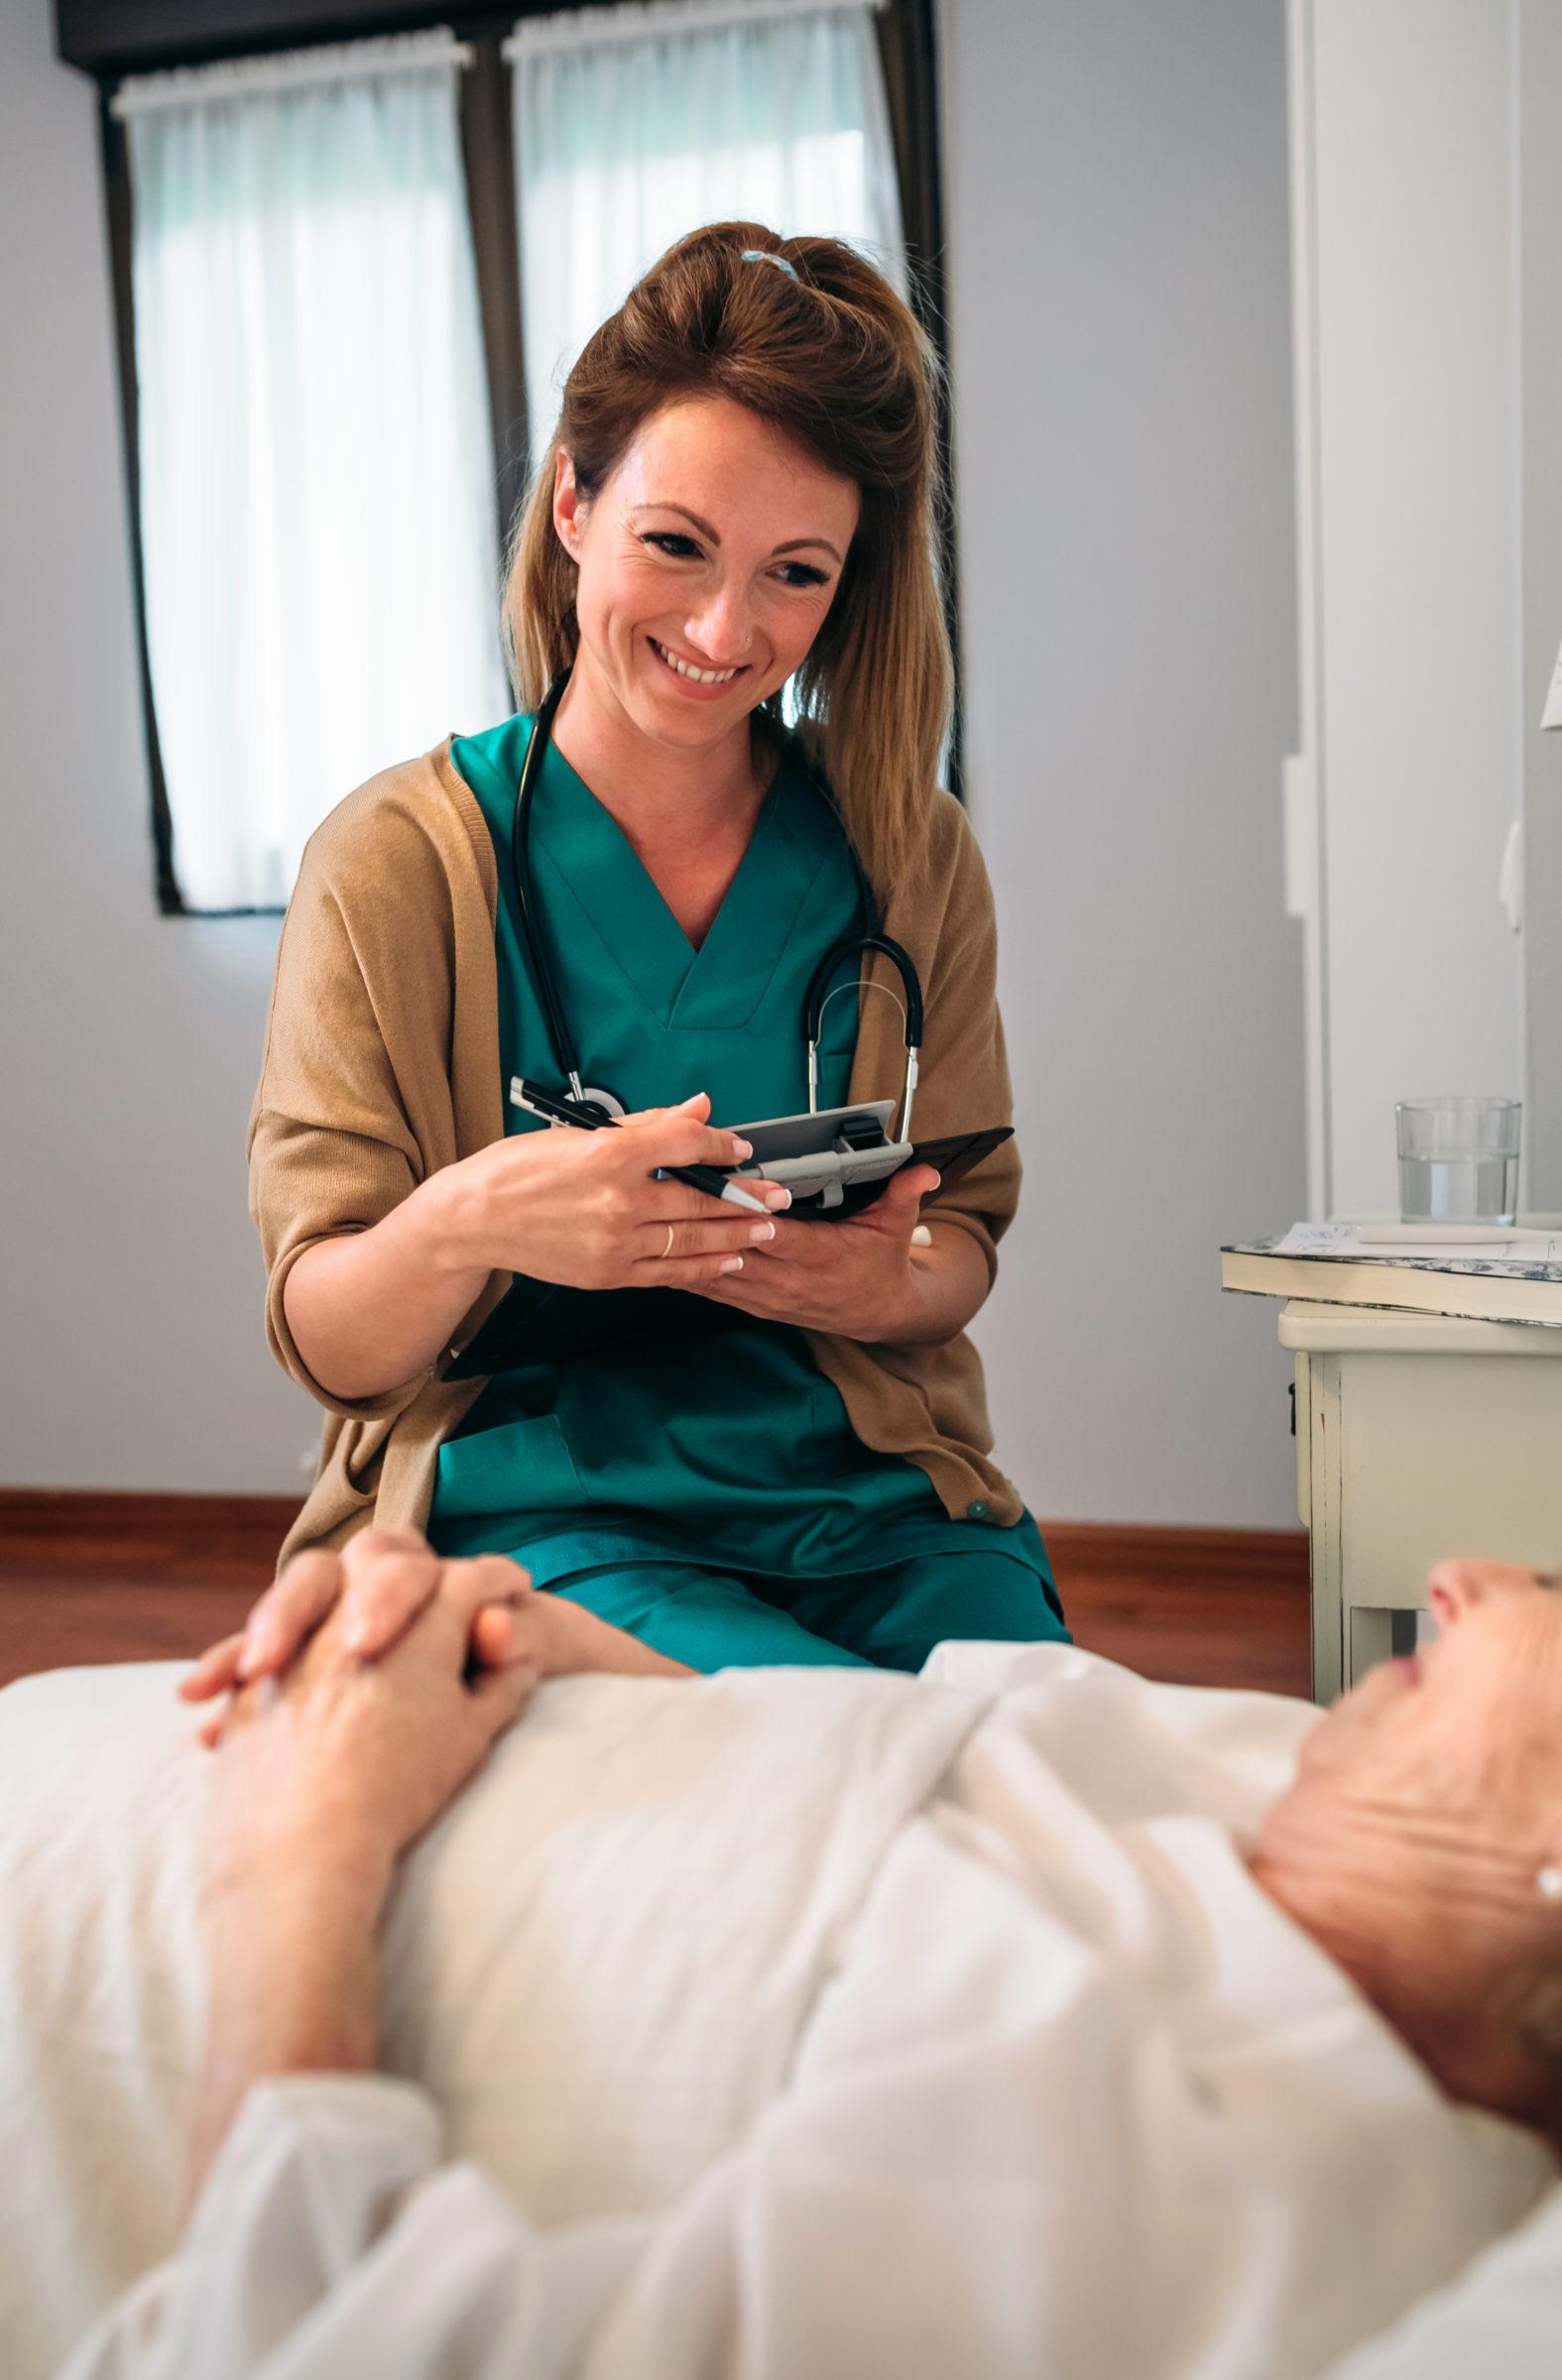 female doctor comforting older patient RDKMH5V